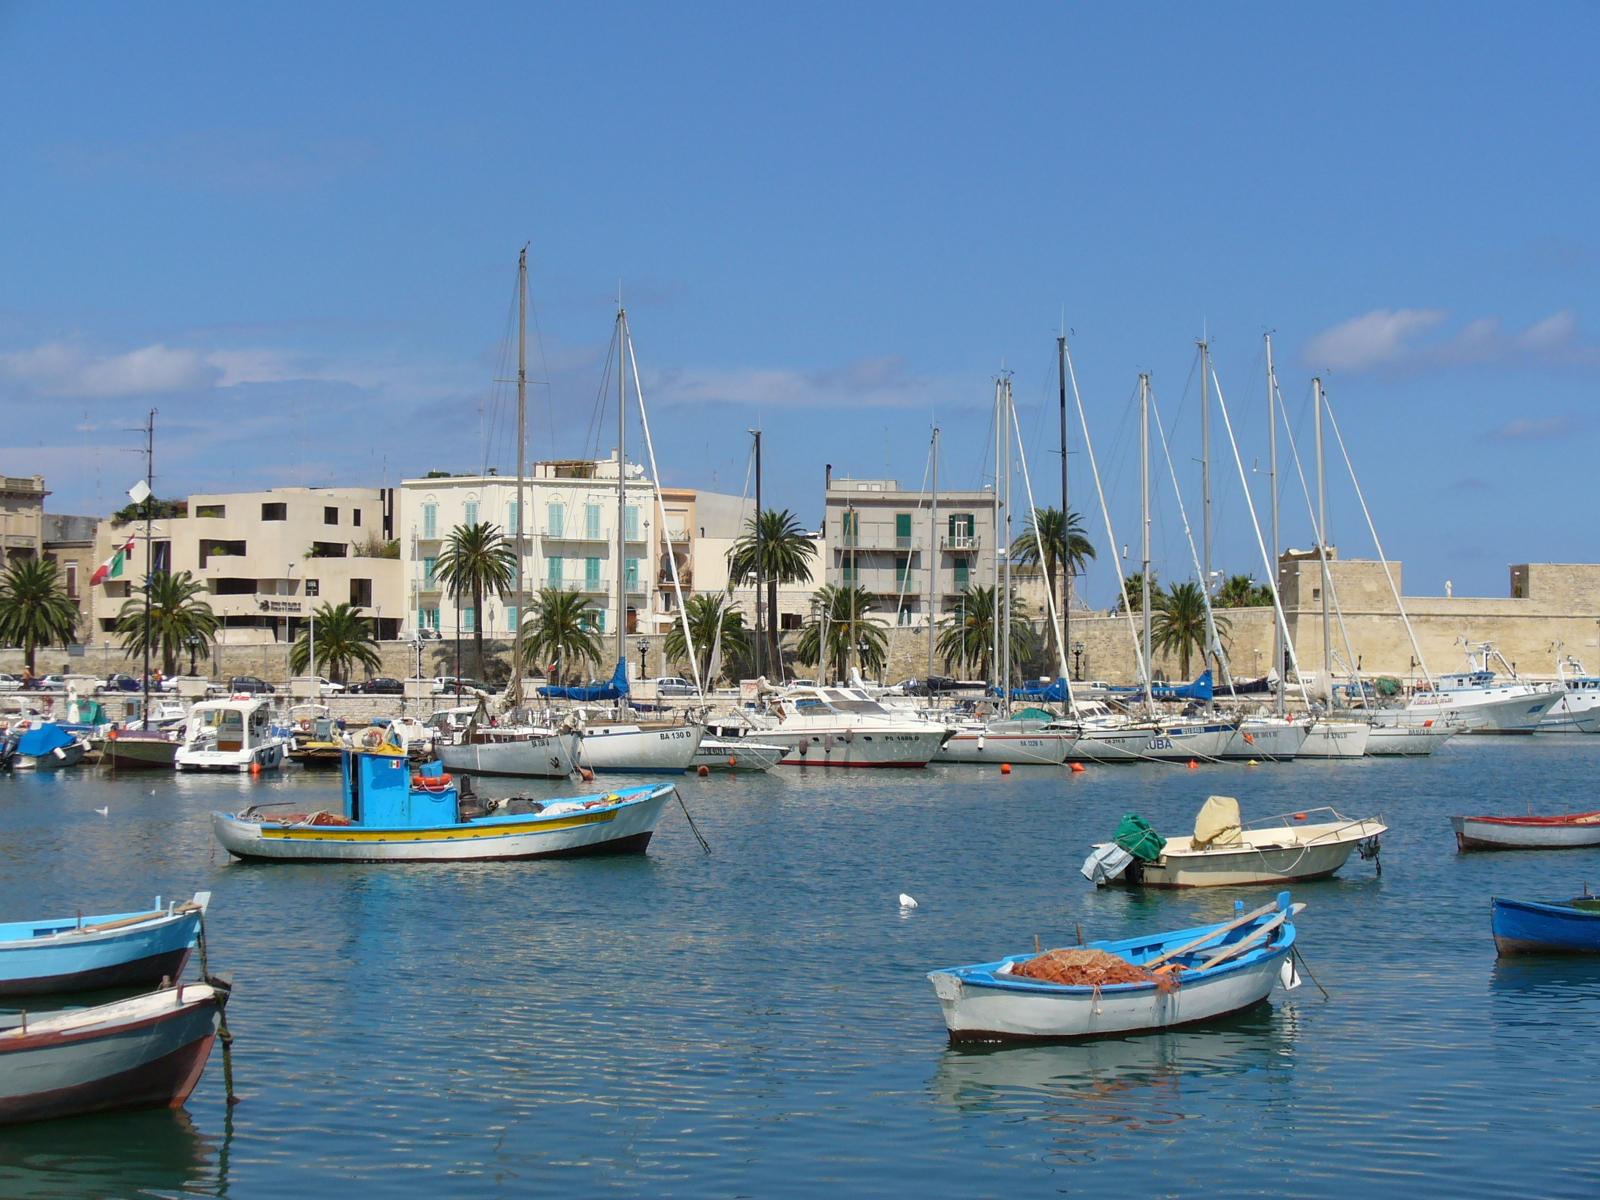 Description The Port Of Bari  Italy  L  Moptier